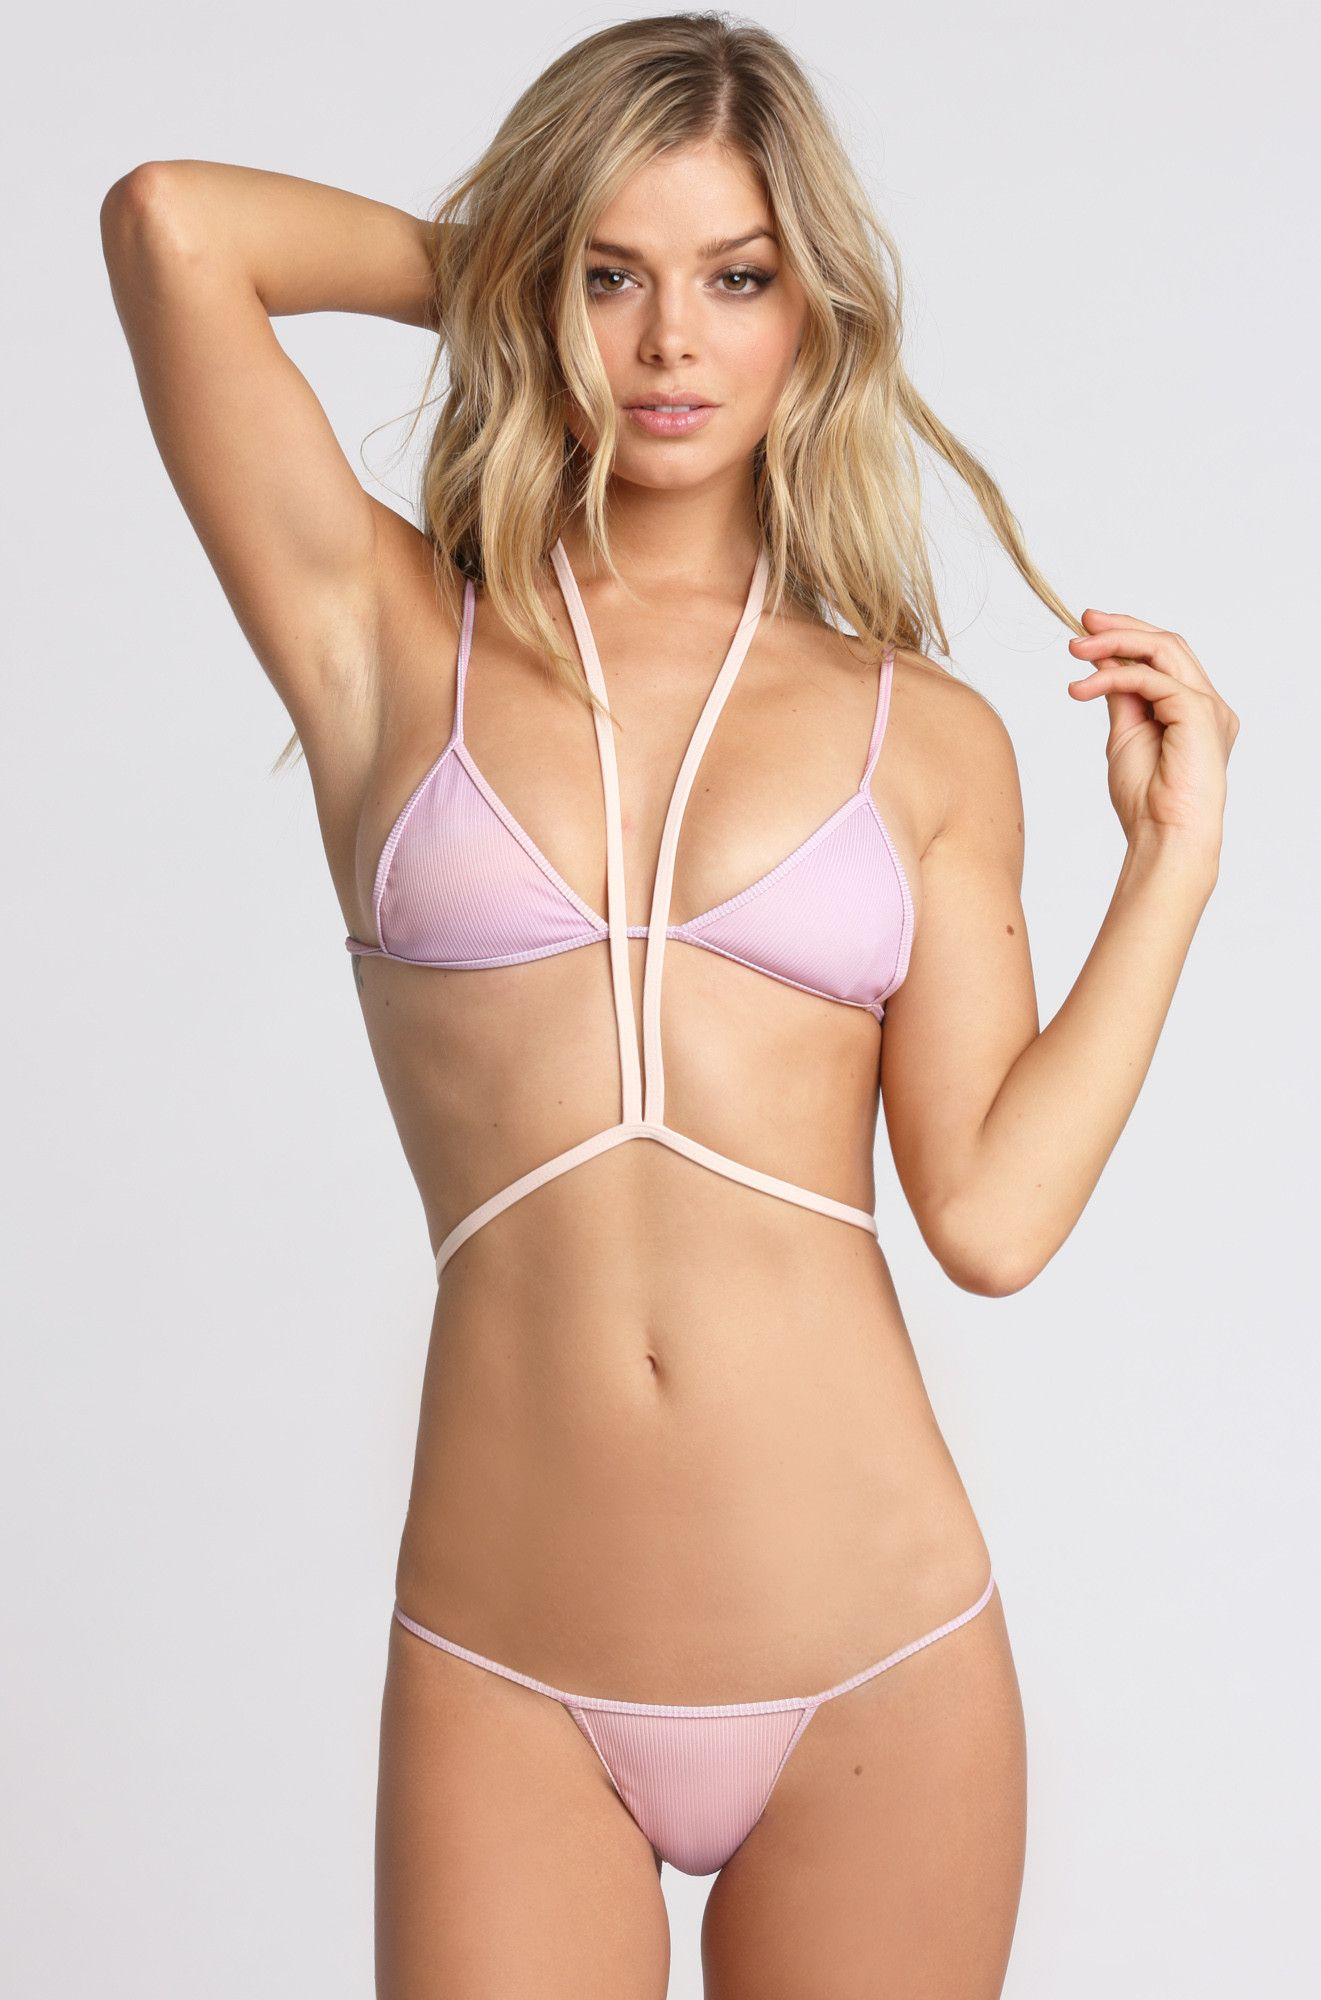 Cleavage Danielle Knudson nude photos 2019